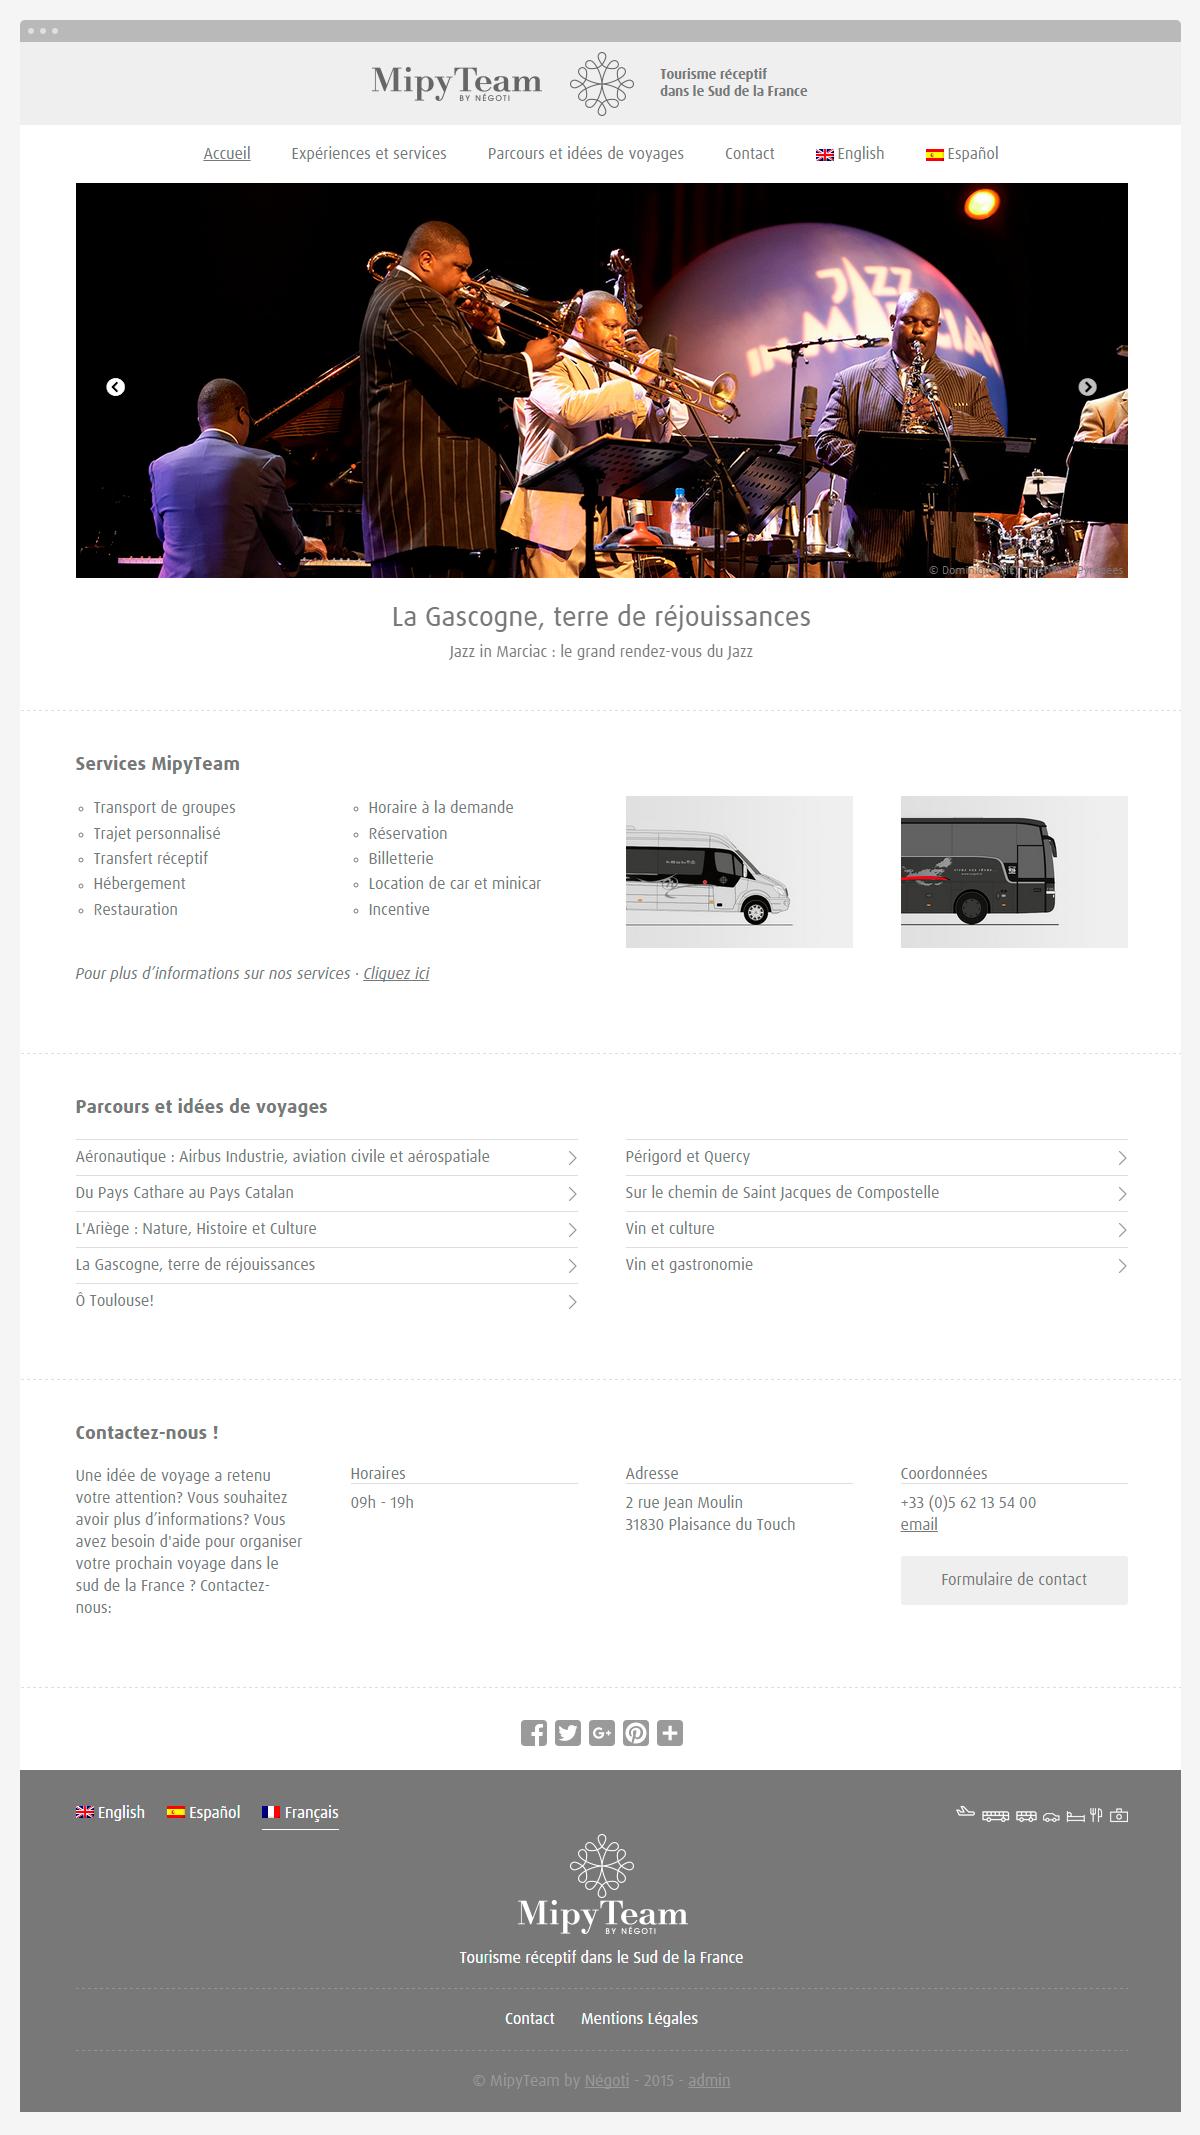 mipyteam-design-web-desktop-01